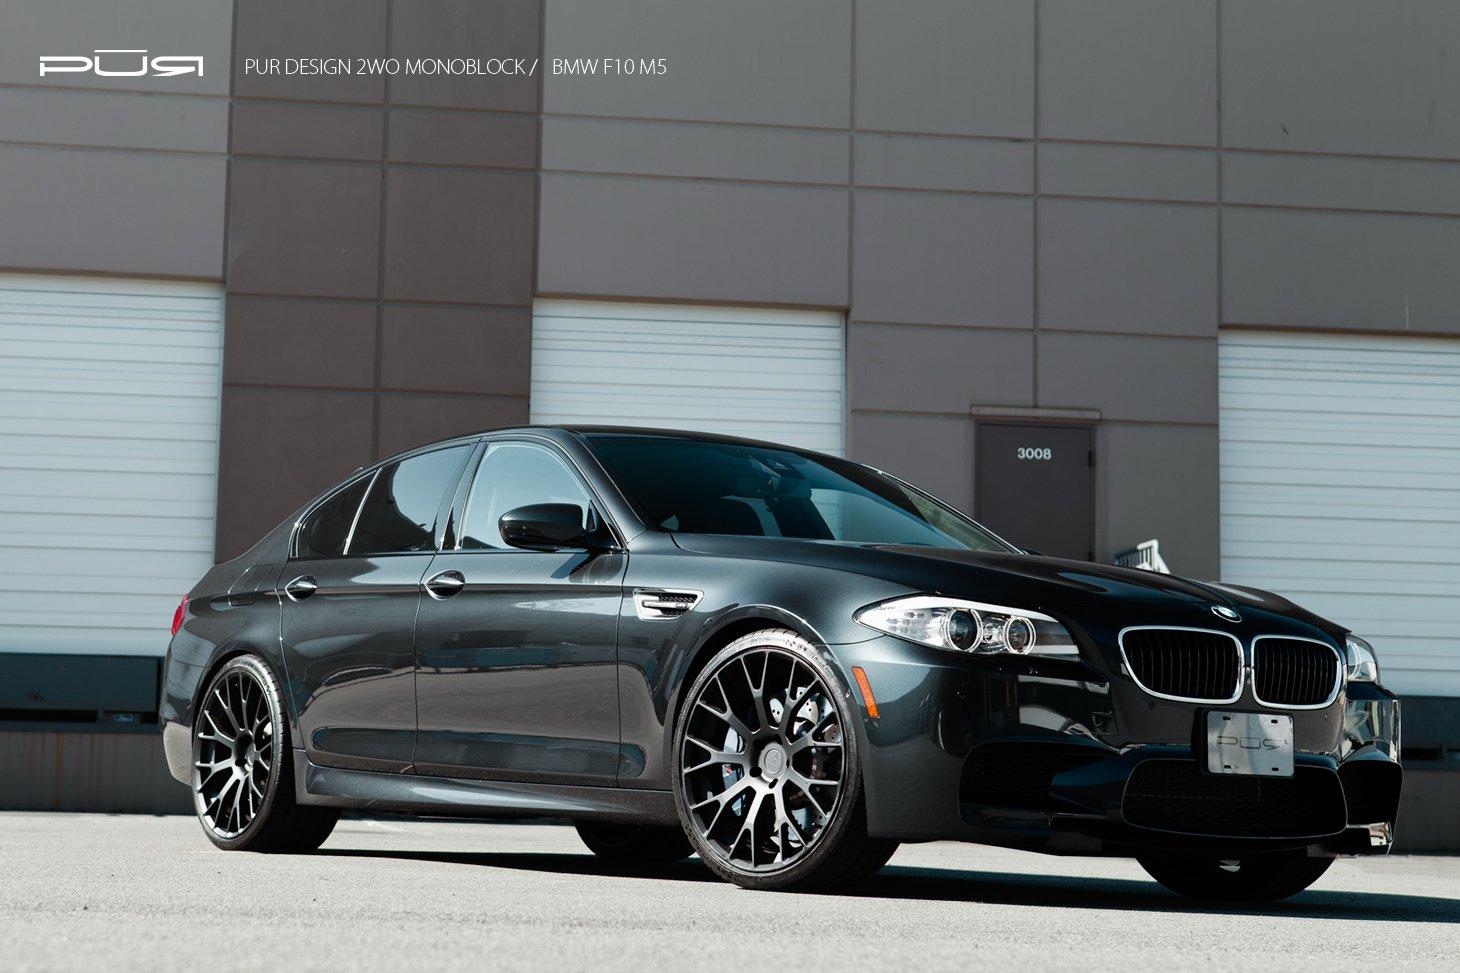 BMW M5 f10 wallpaper 1460x973 371513 WallpaperUP 1460x973